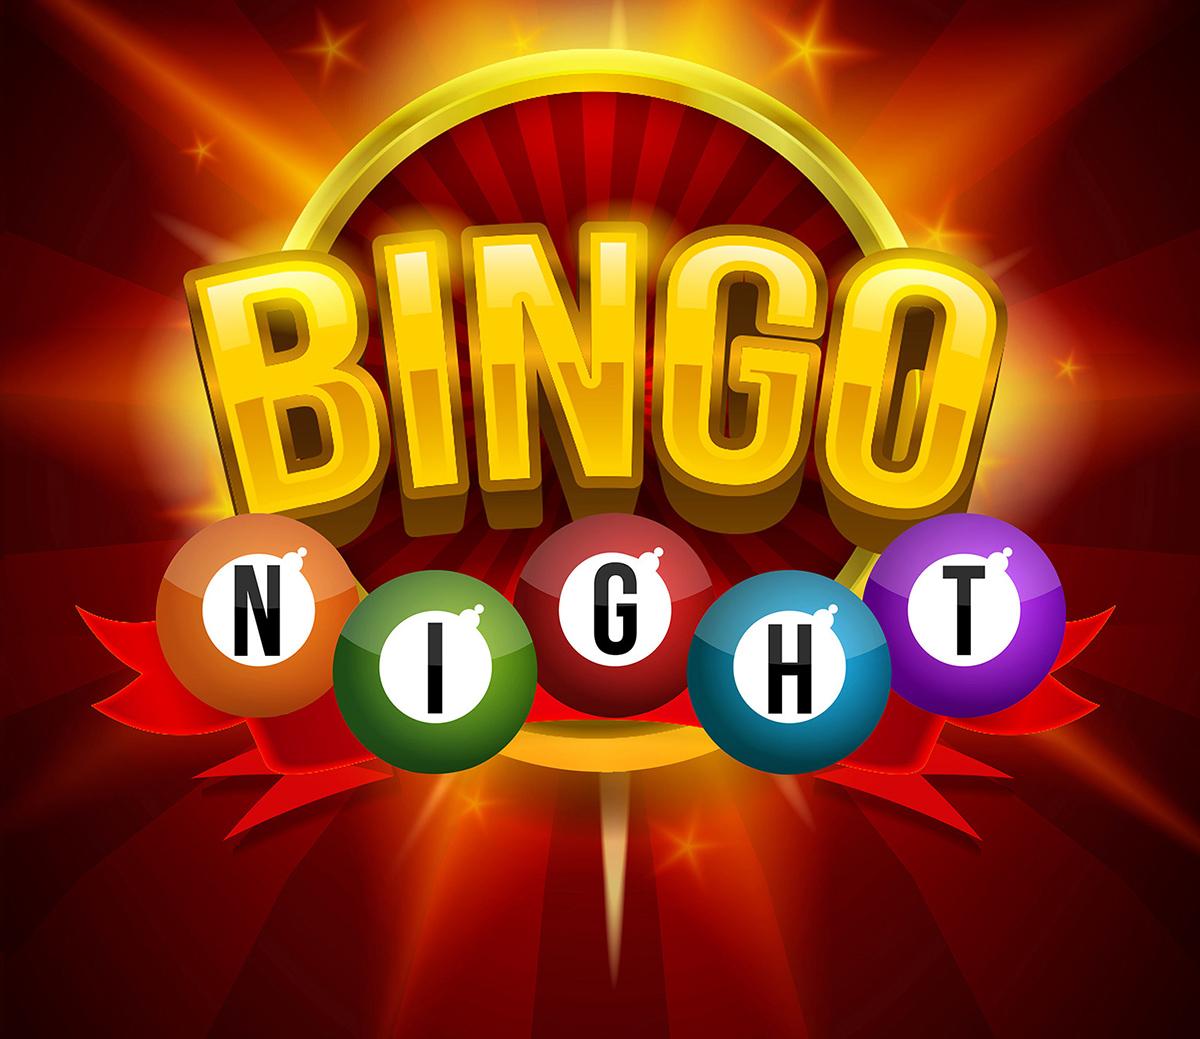 Bingo Night Event Lukes Helping Hand